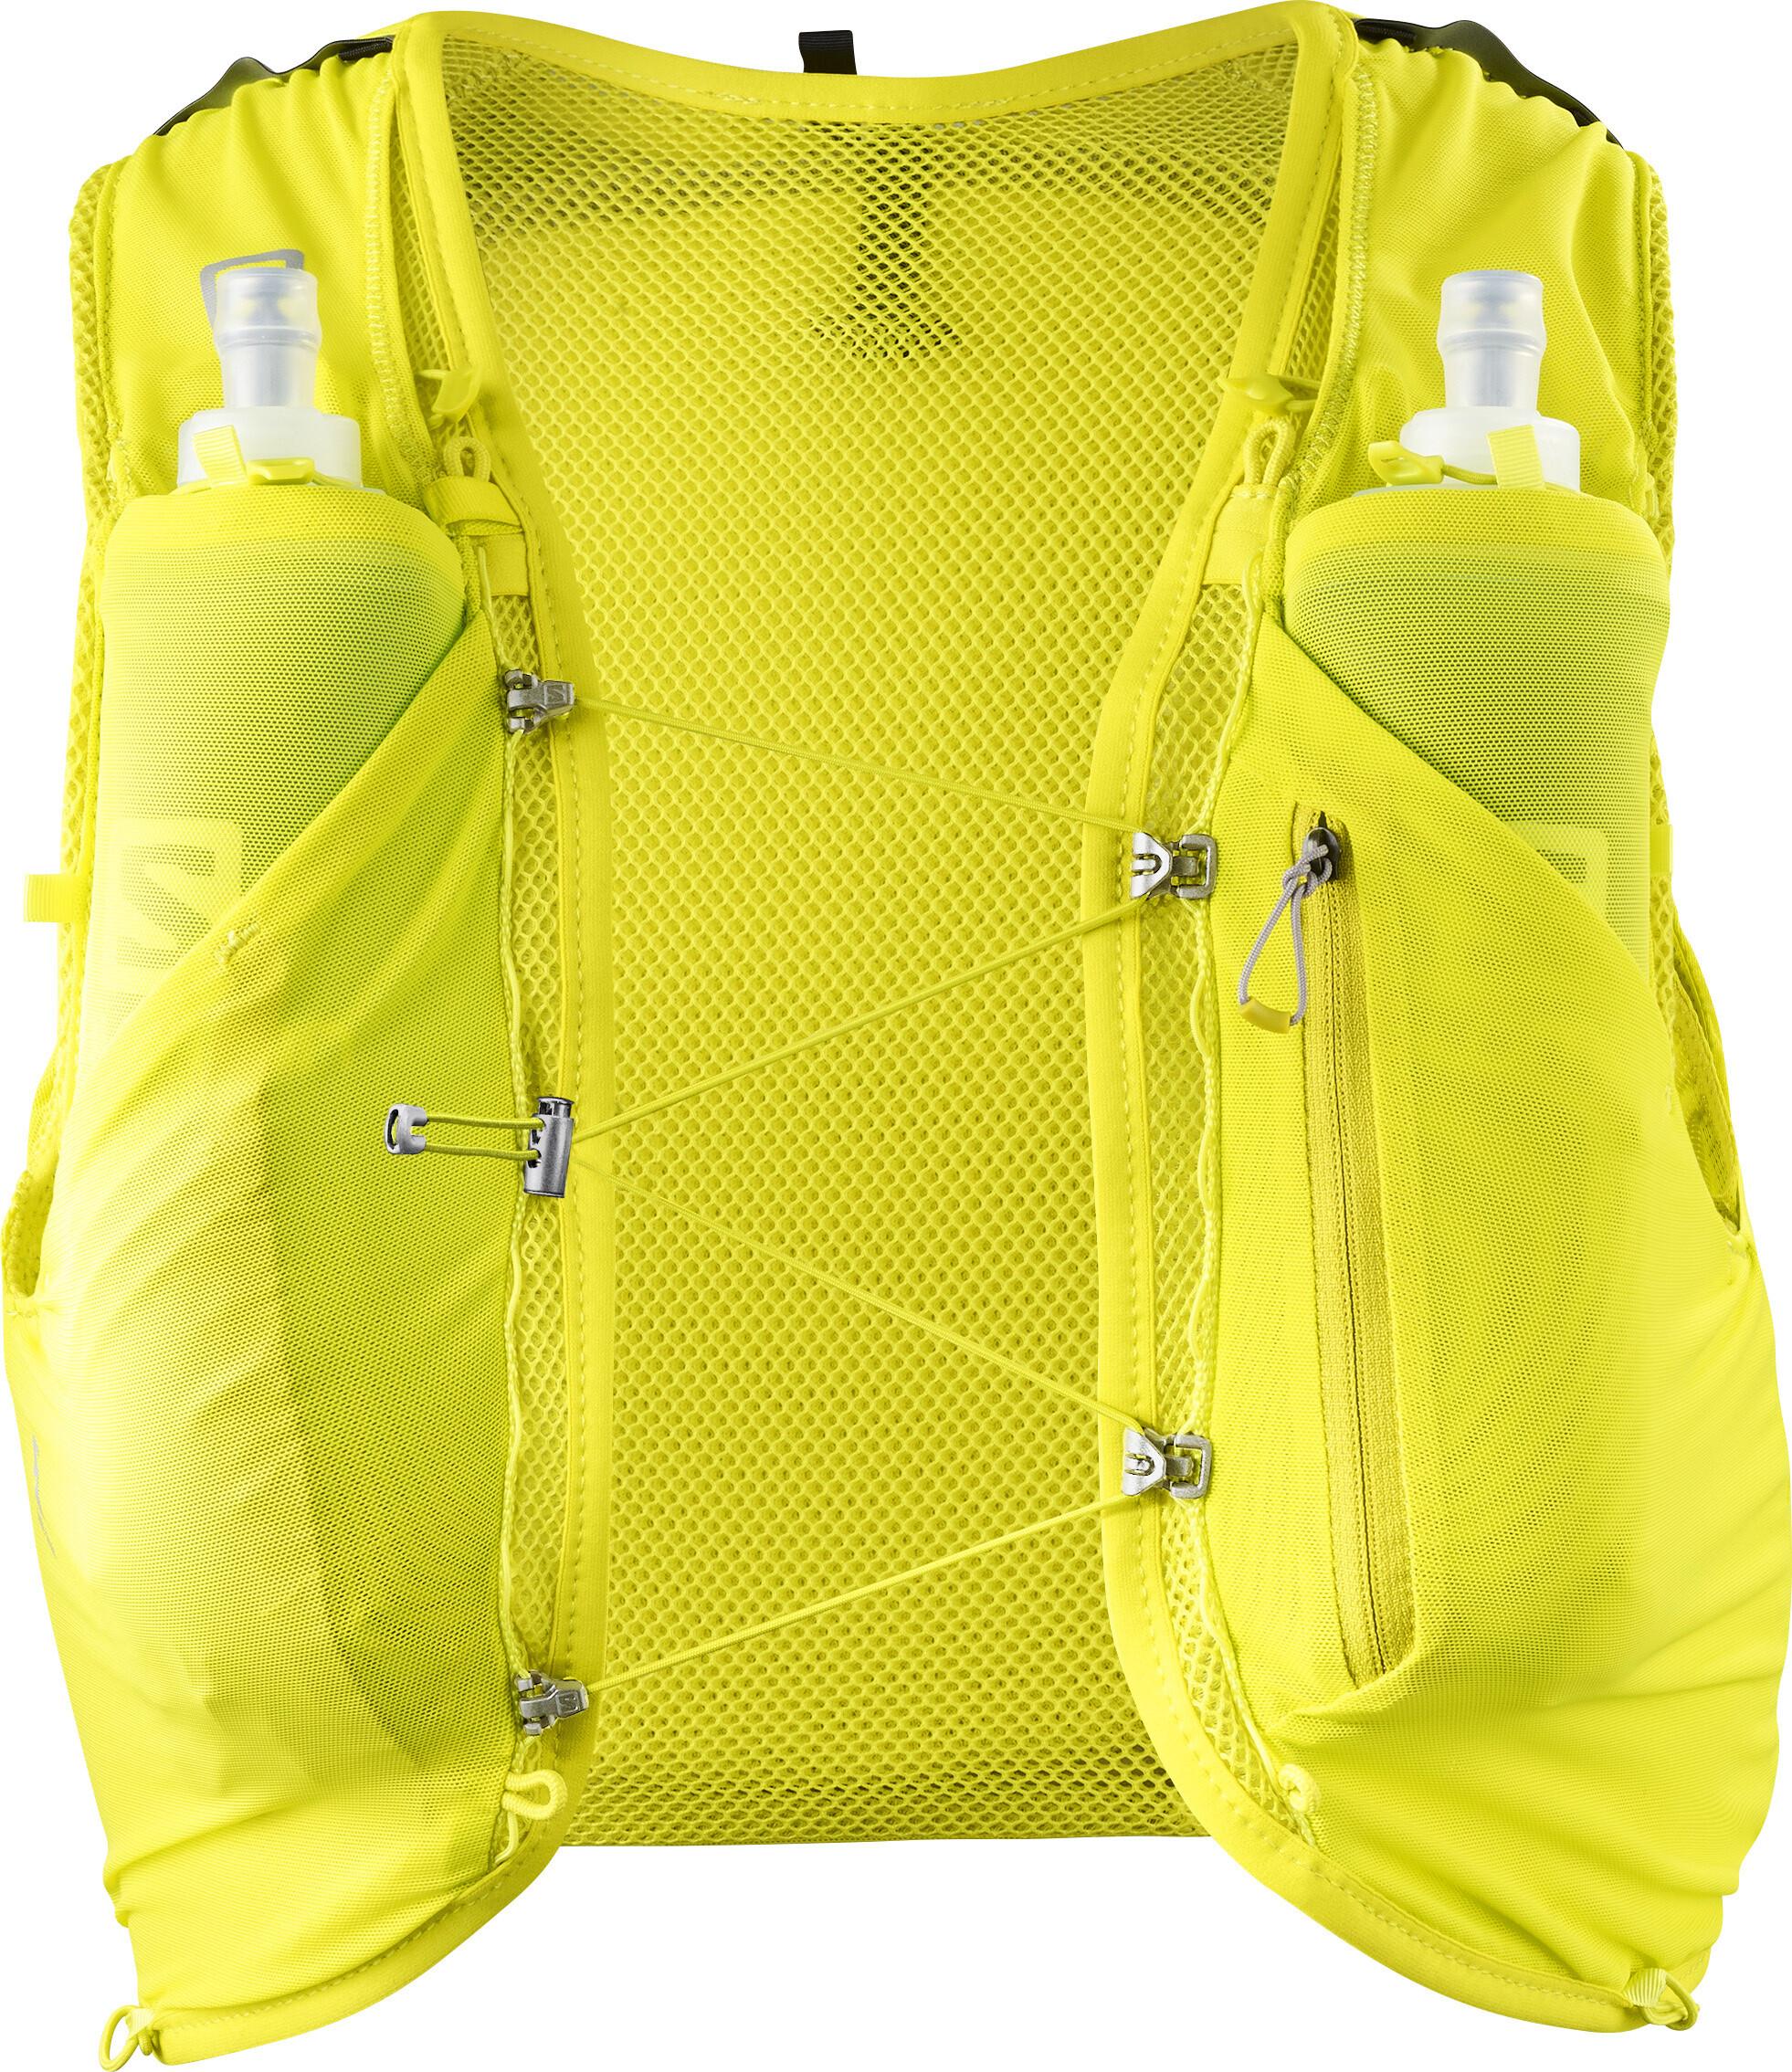 afcaac5c77 Salomon Adv Skin 5 Backpack Set sulphur spring/citronelle